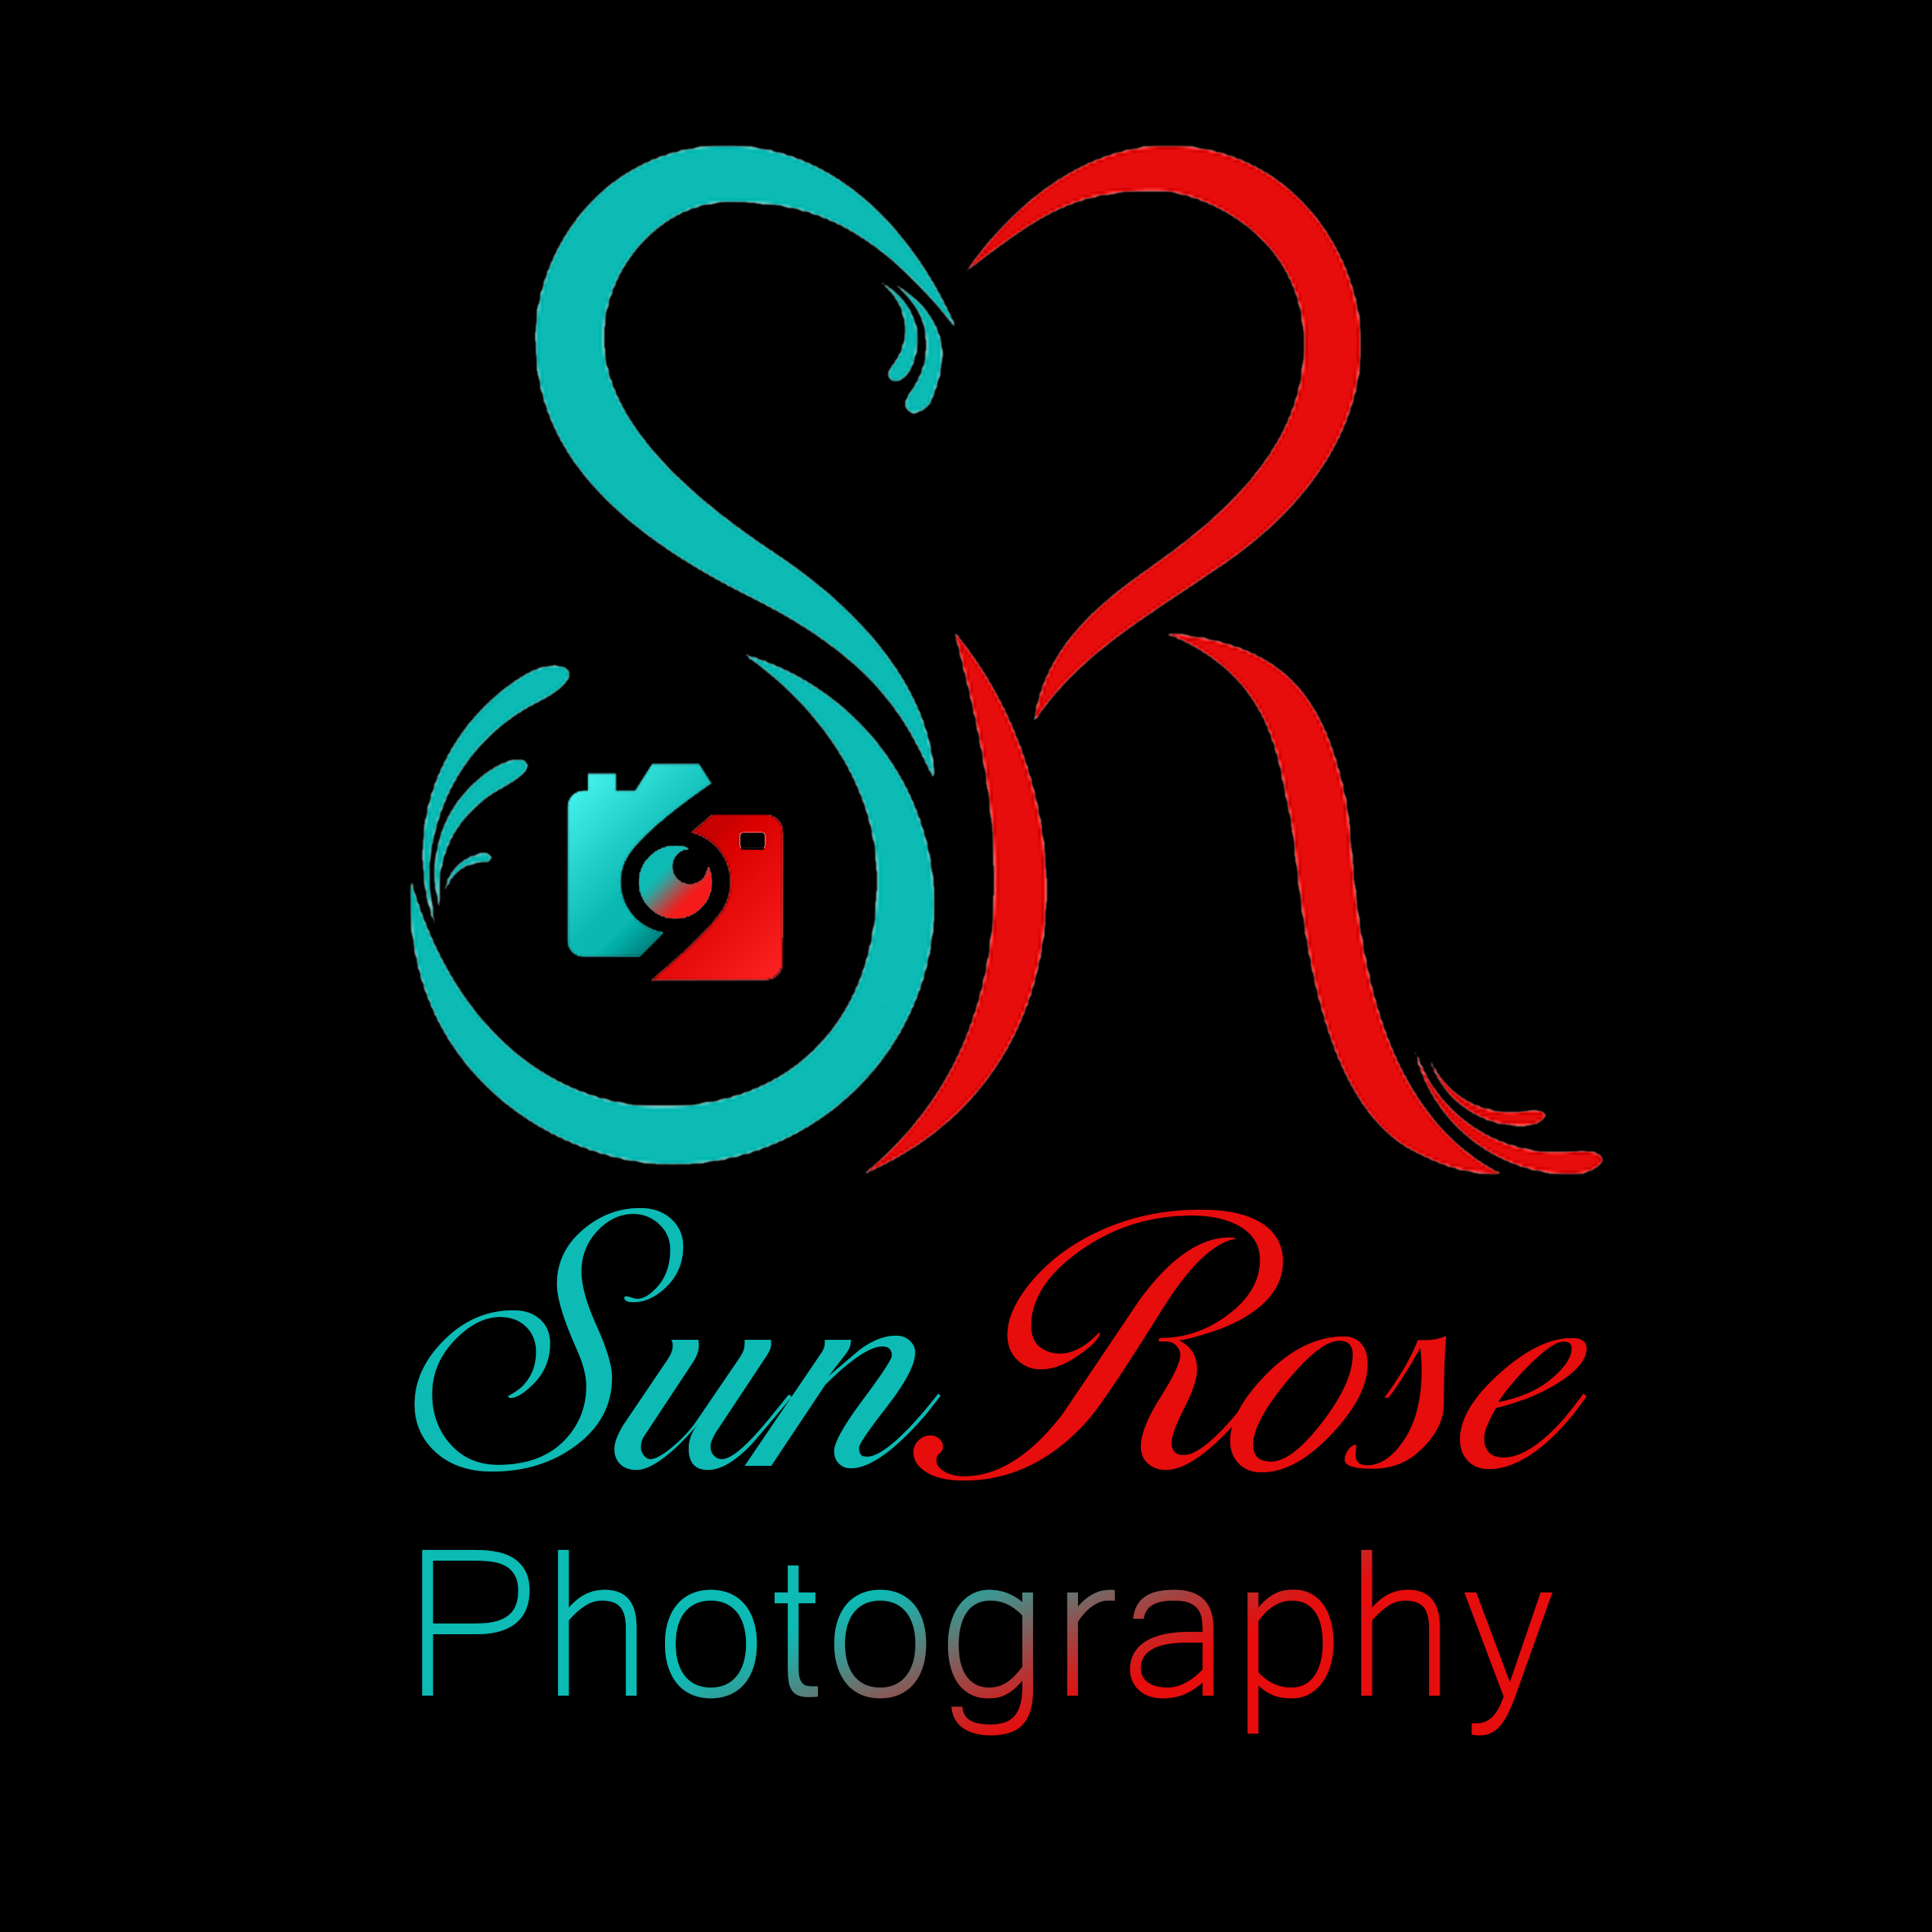 SunRose Photography